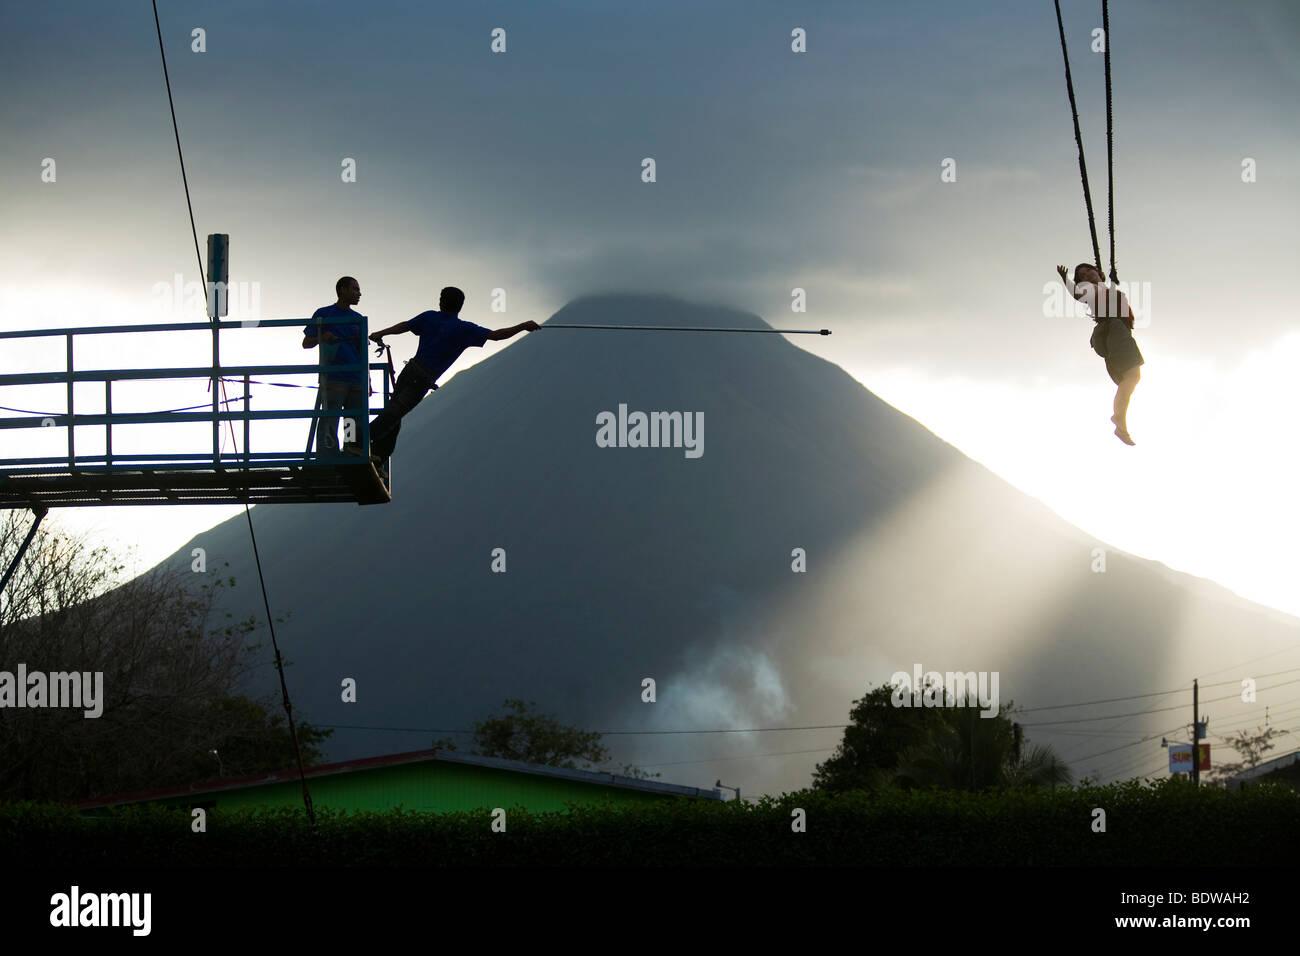 Ein Himmel Kran Katapult in Aktion in La Fortuna. Bungy-Sprung abrufen Stockbild